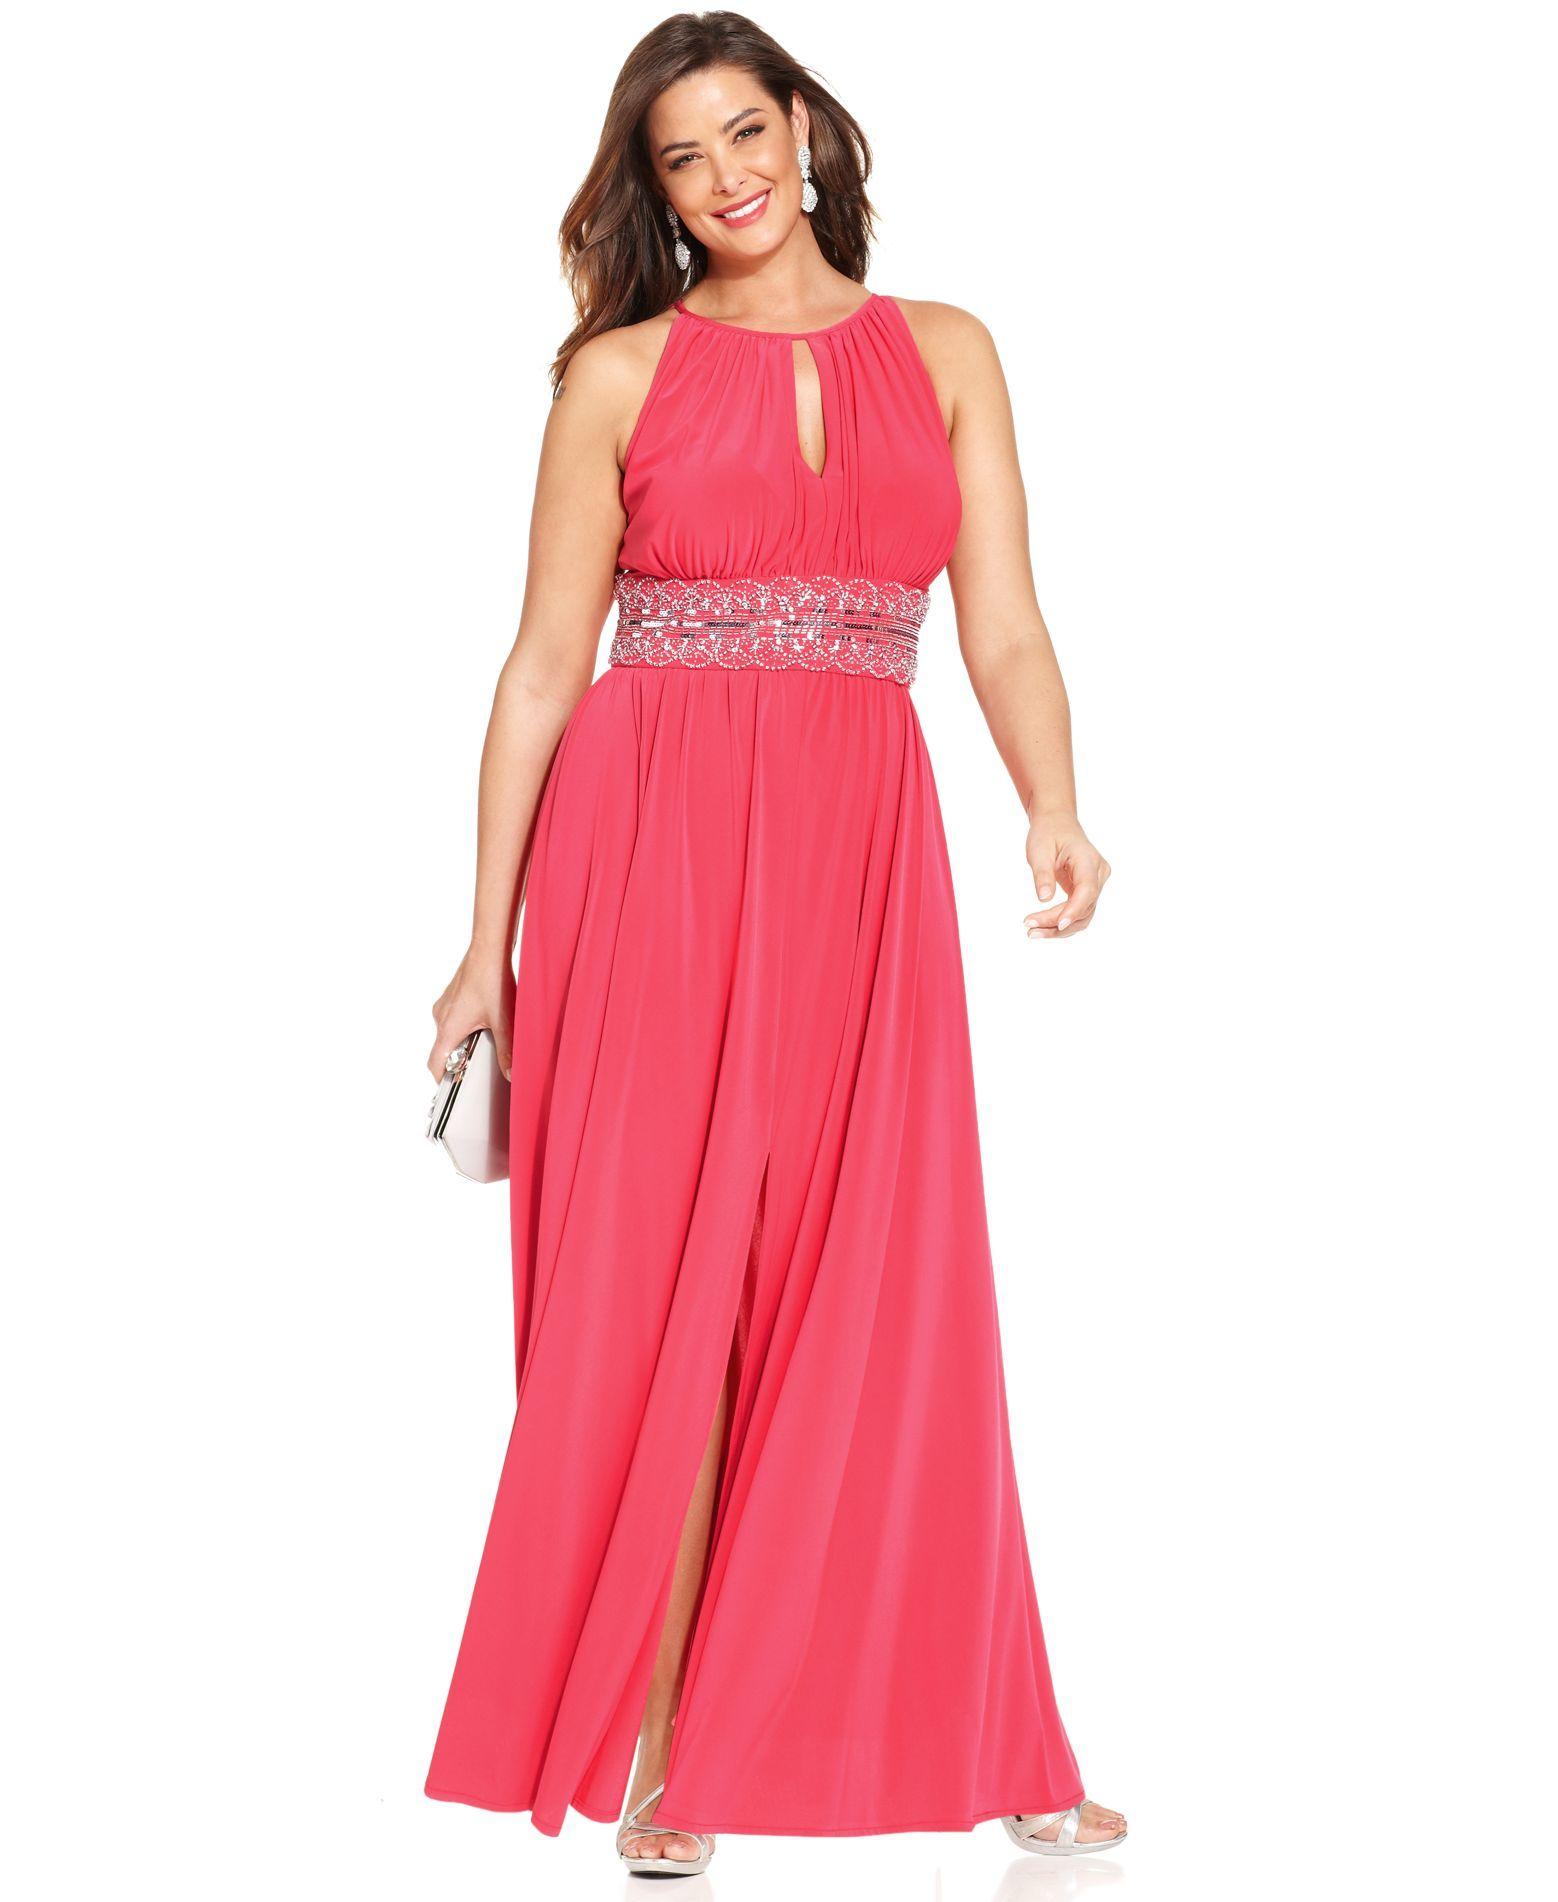 Stunning Macy Plus Size Dress Gallery - Plus Size Clothing ...